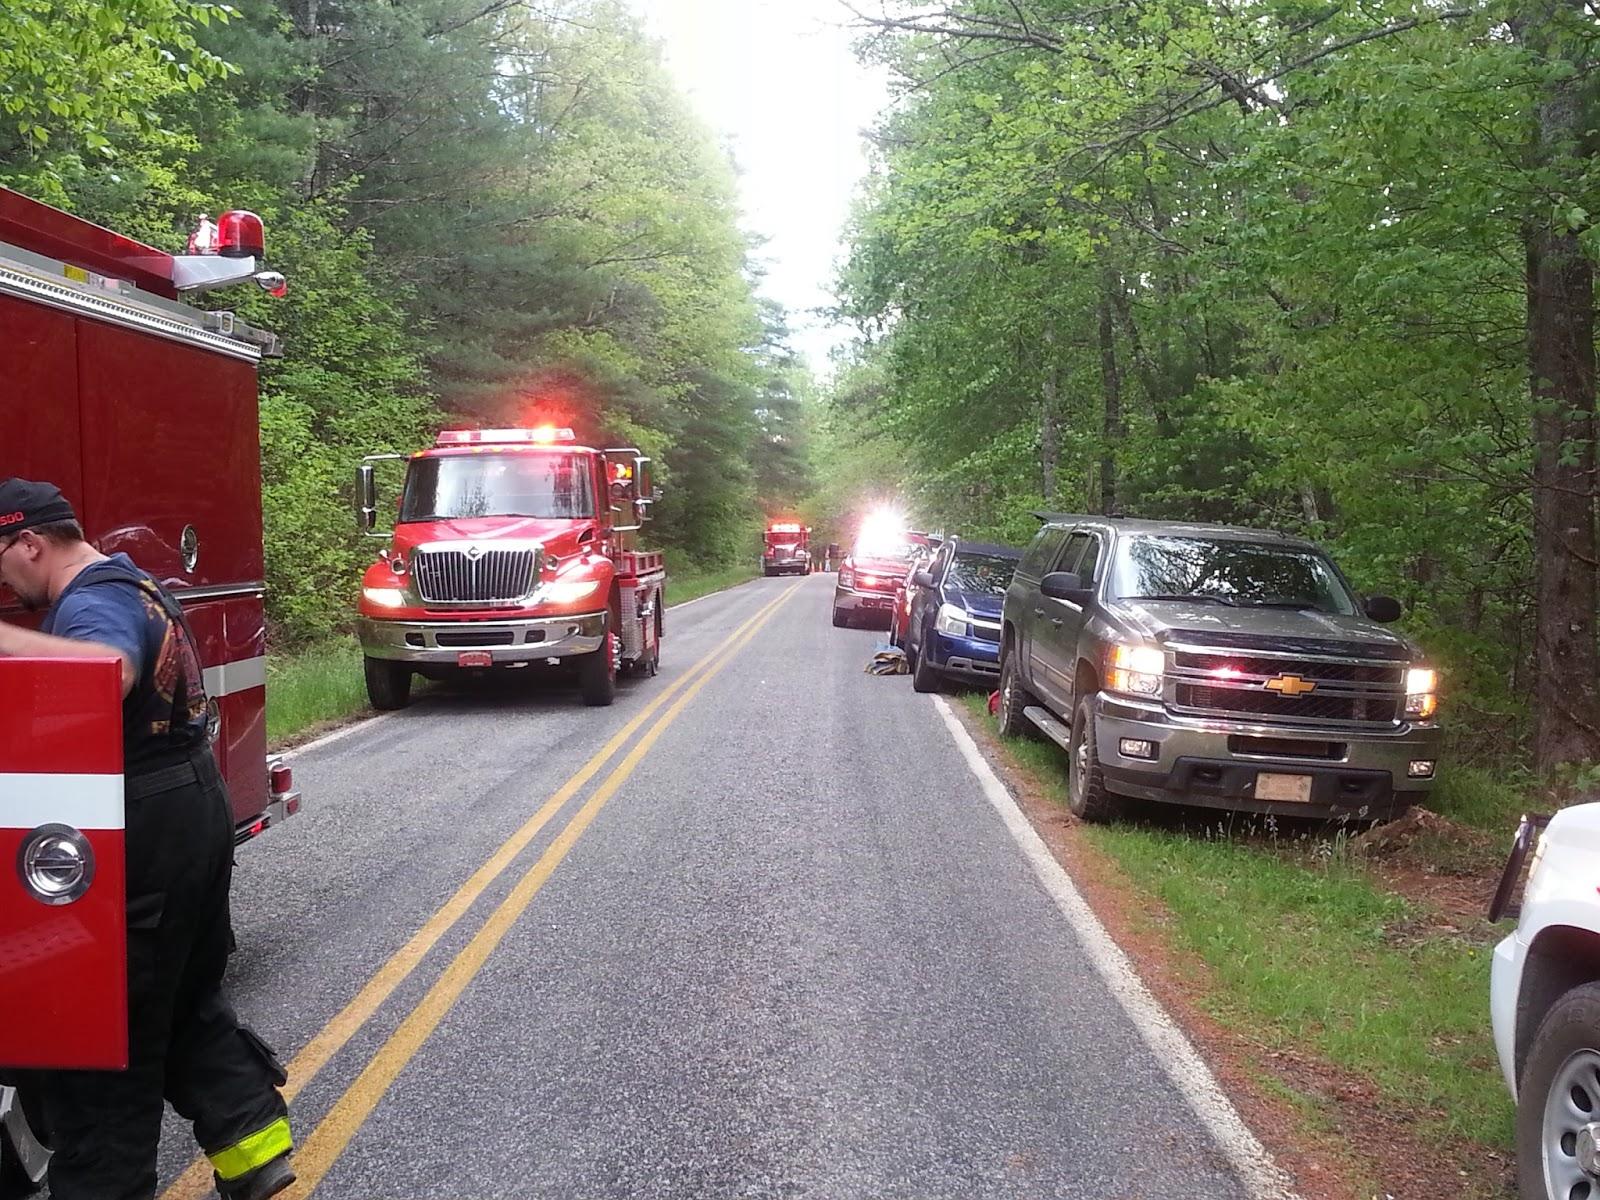 Fire apparatus line Rose Creek Road